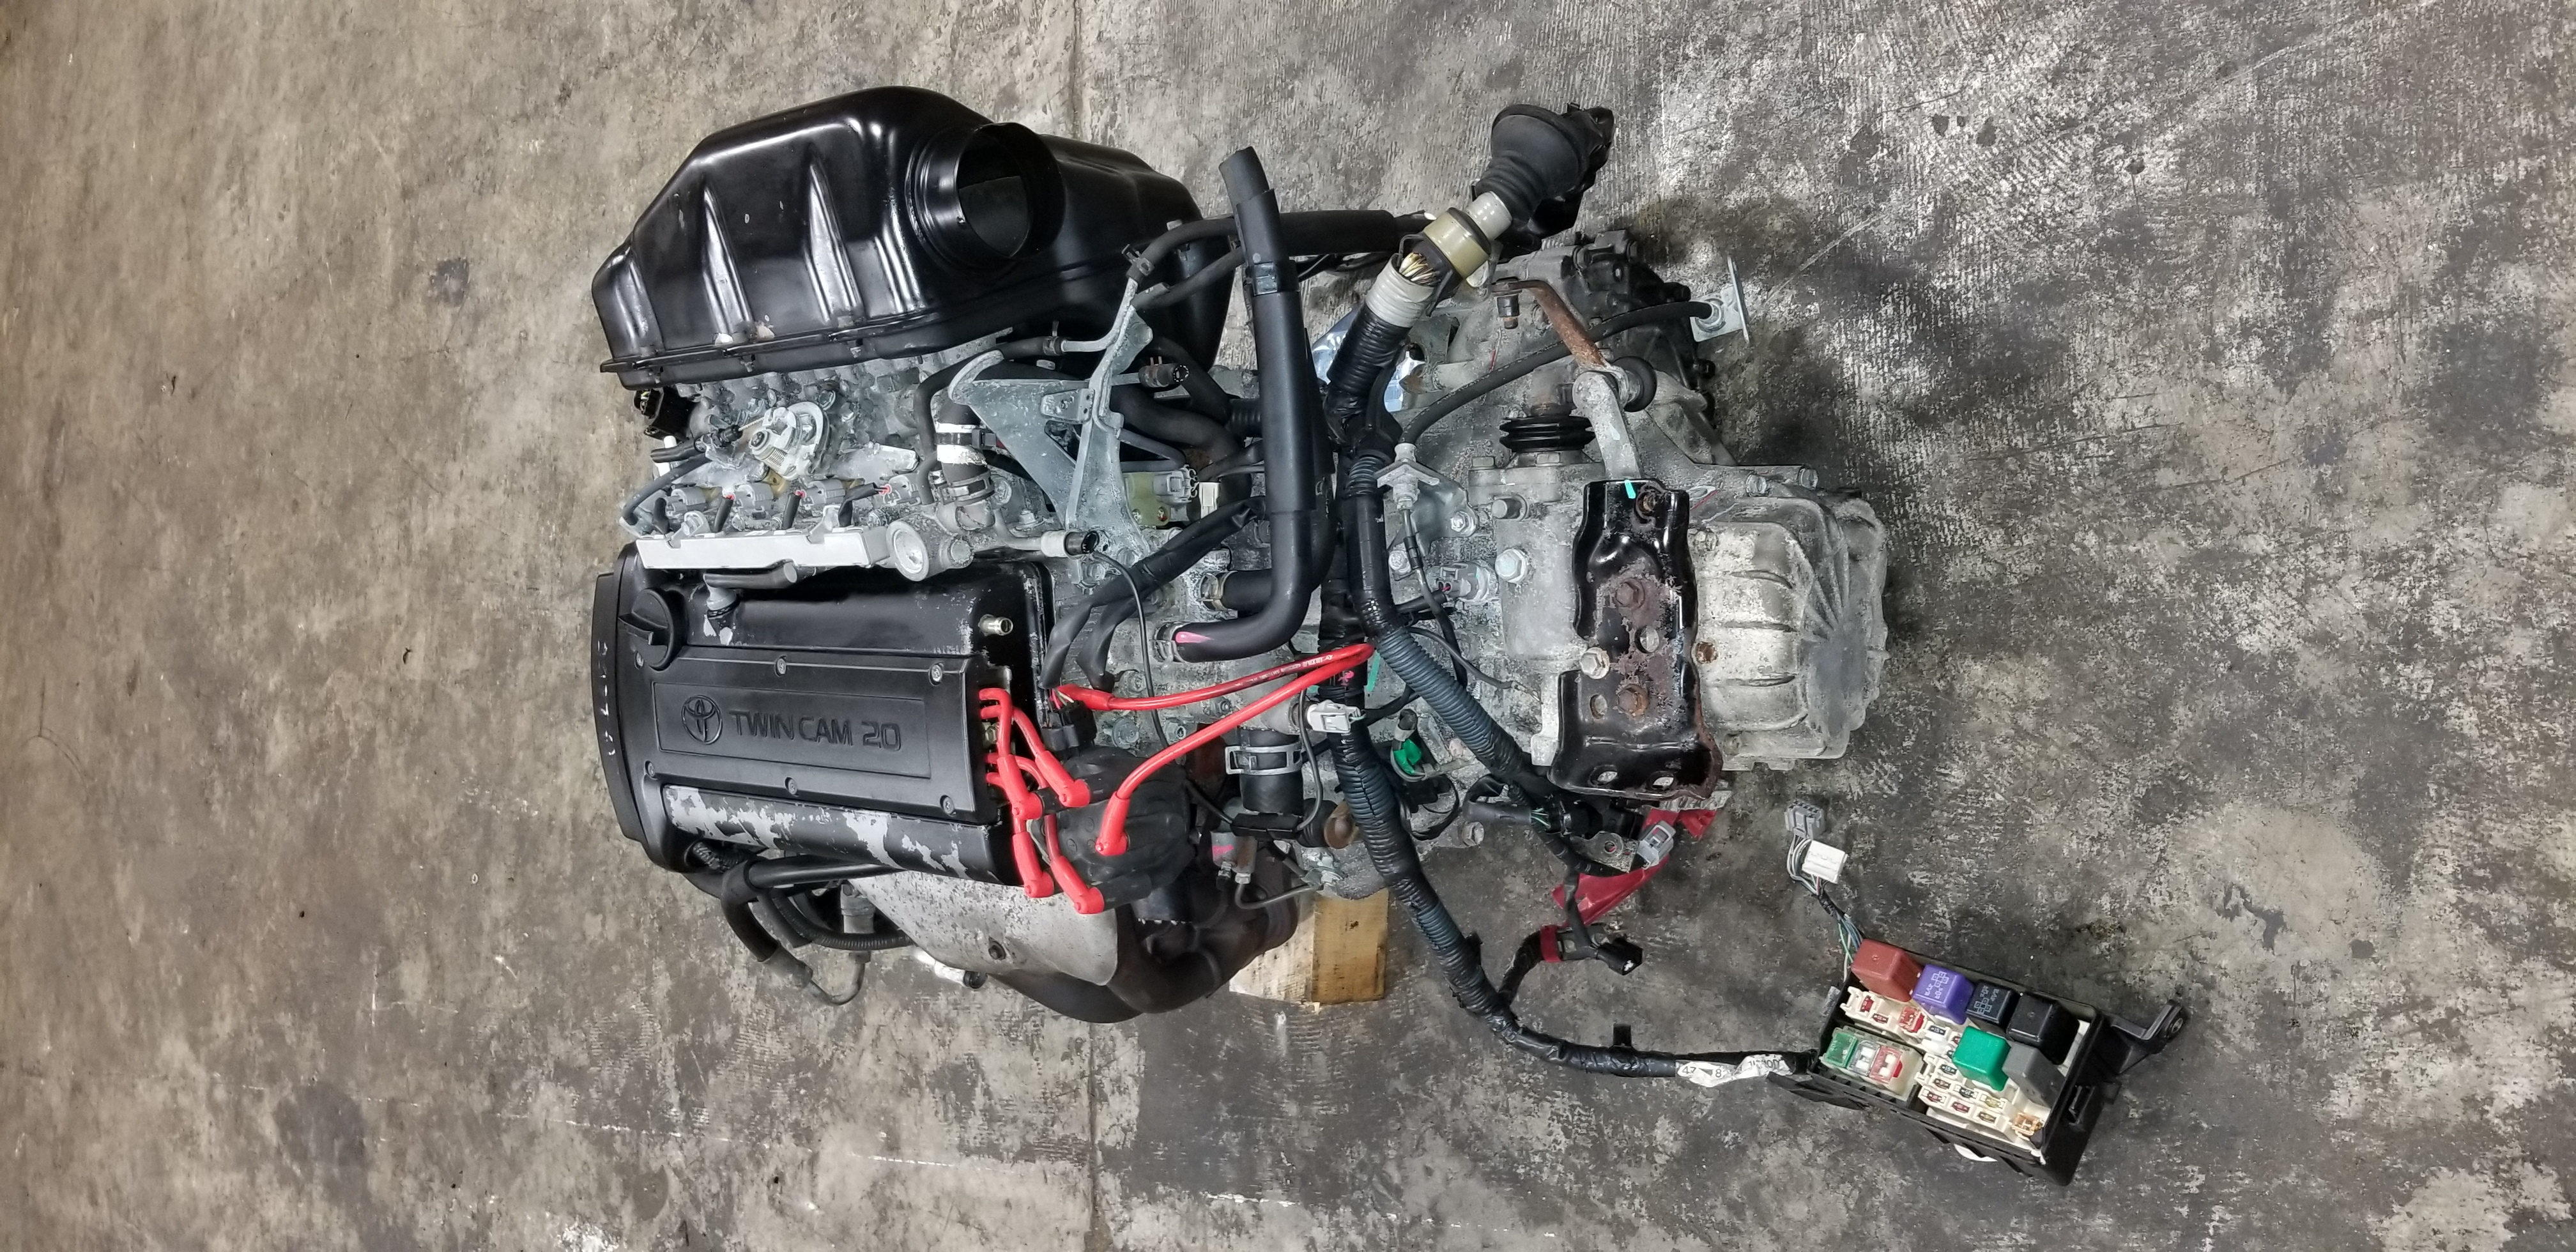 4age 20v Black Top Corolla Ae111 Complete Engine Swap M T 5 Speed Kompressor Toyota Corona Twincam Denso